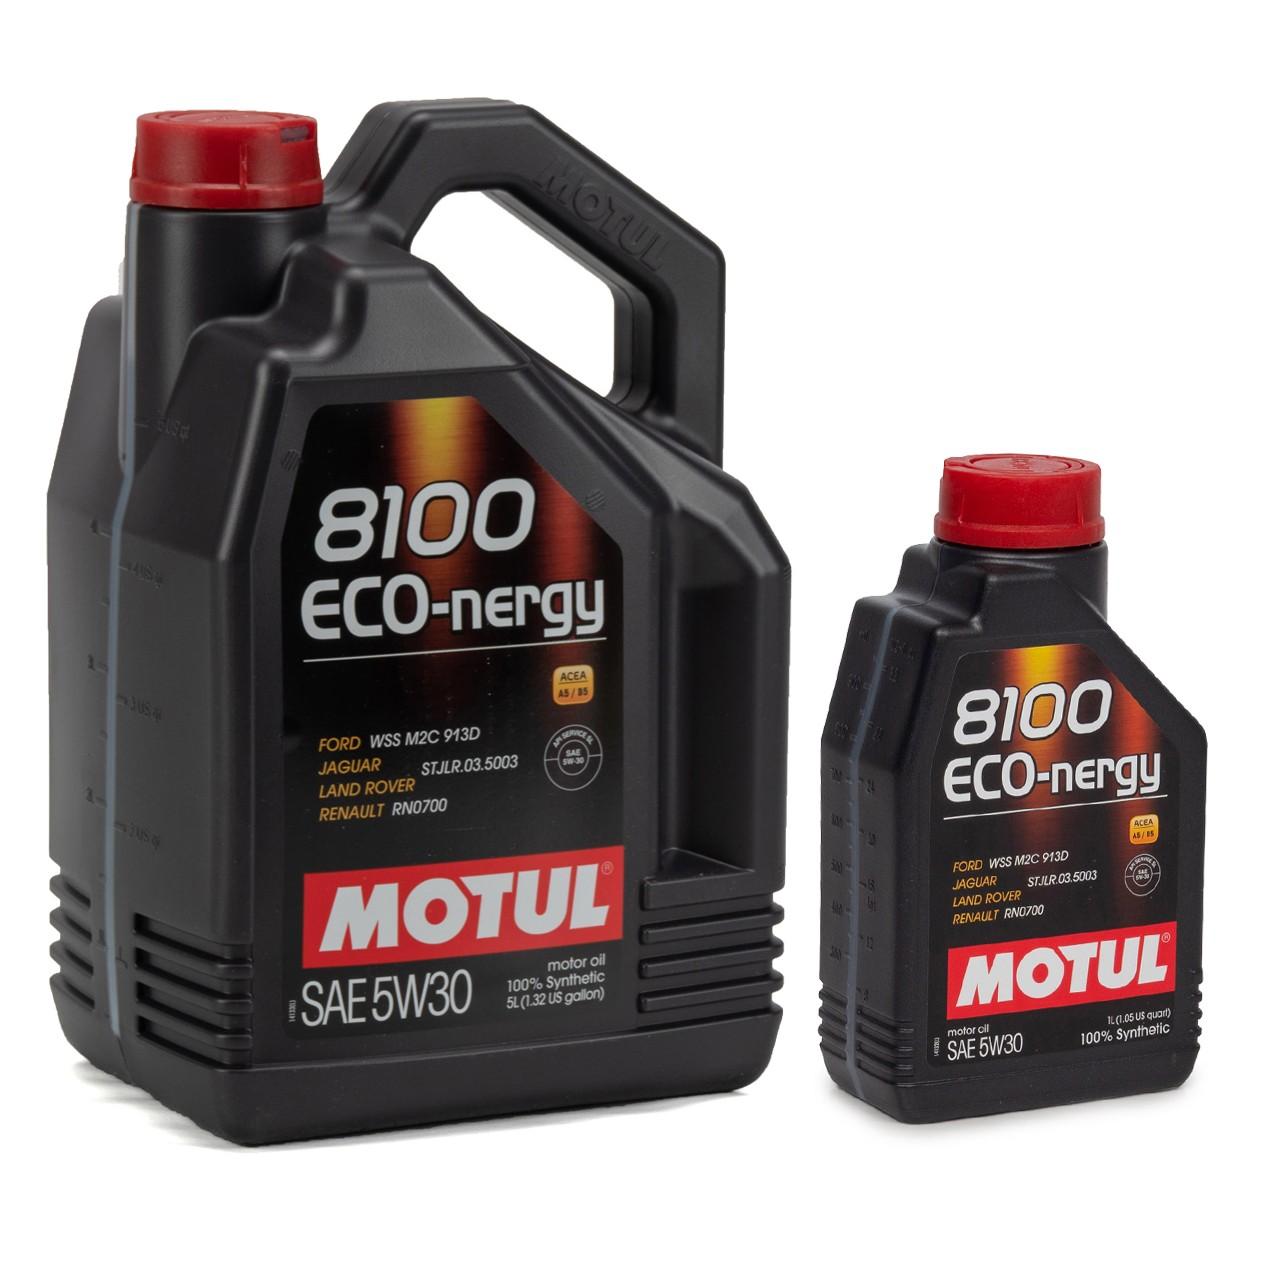 MOTUL 8100 ECO-nergy Motoröl Öl 5W30 FORD WSS M2C 913D RENAULT RN0700 - 6 Liter